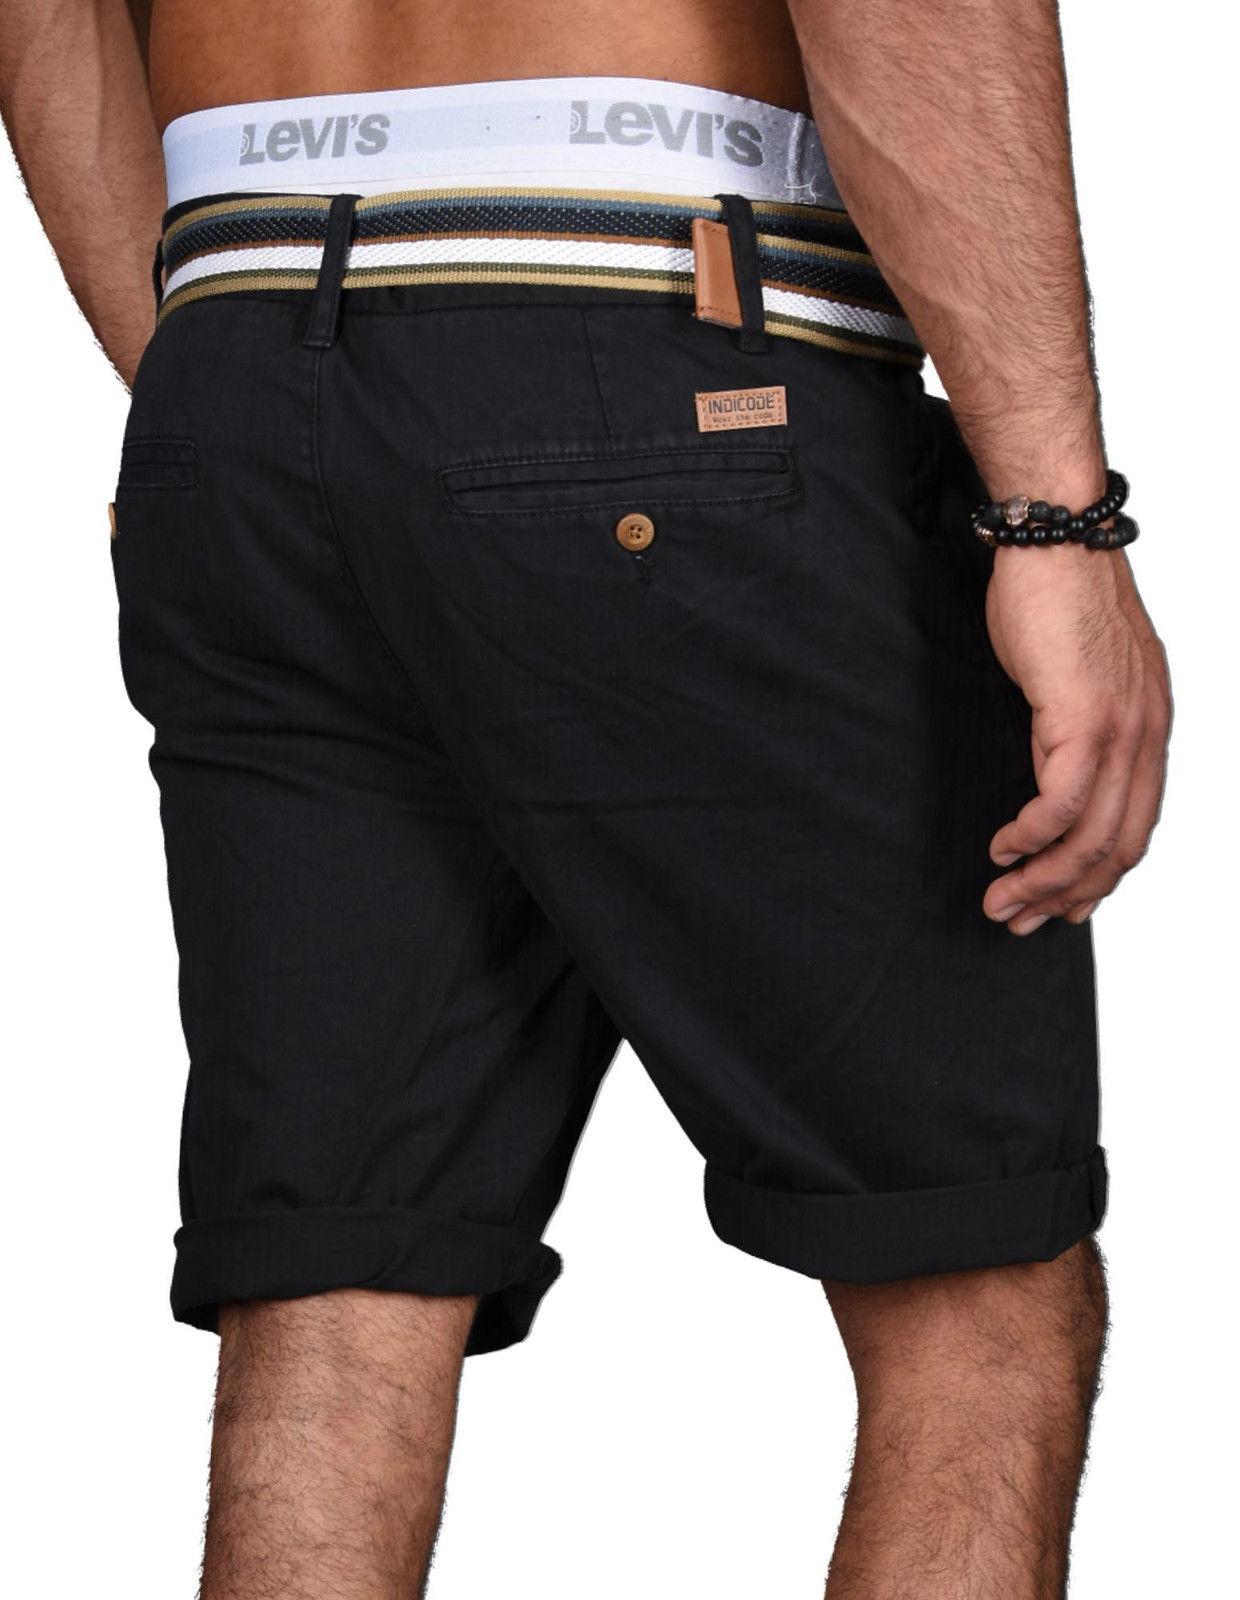 Indicode-Herren-Sommer-Bermuda-Chino-Shorts-kurze-Hose-Sommerhose-Short-NEU-B499 Indexbild 28